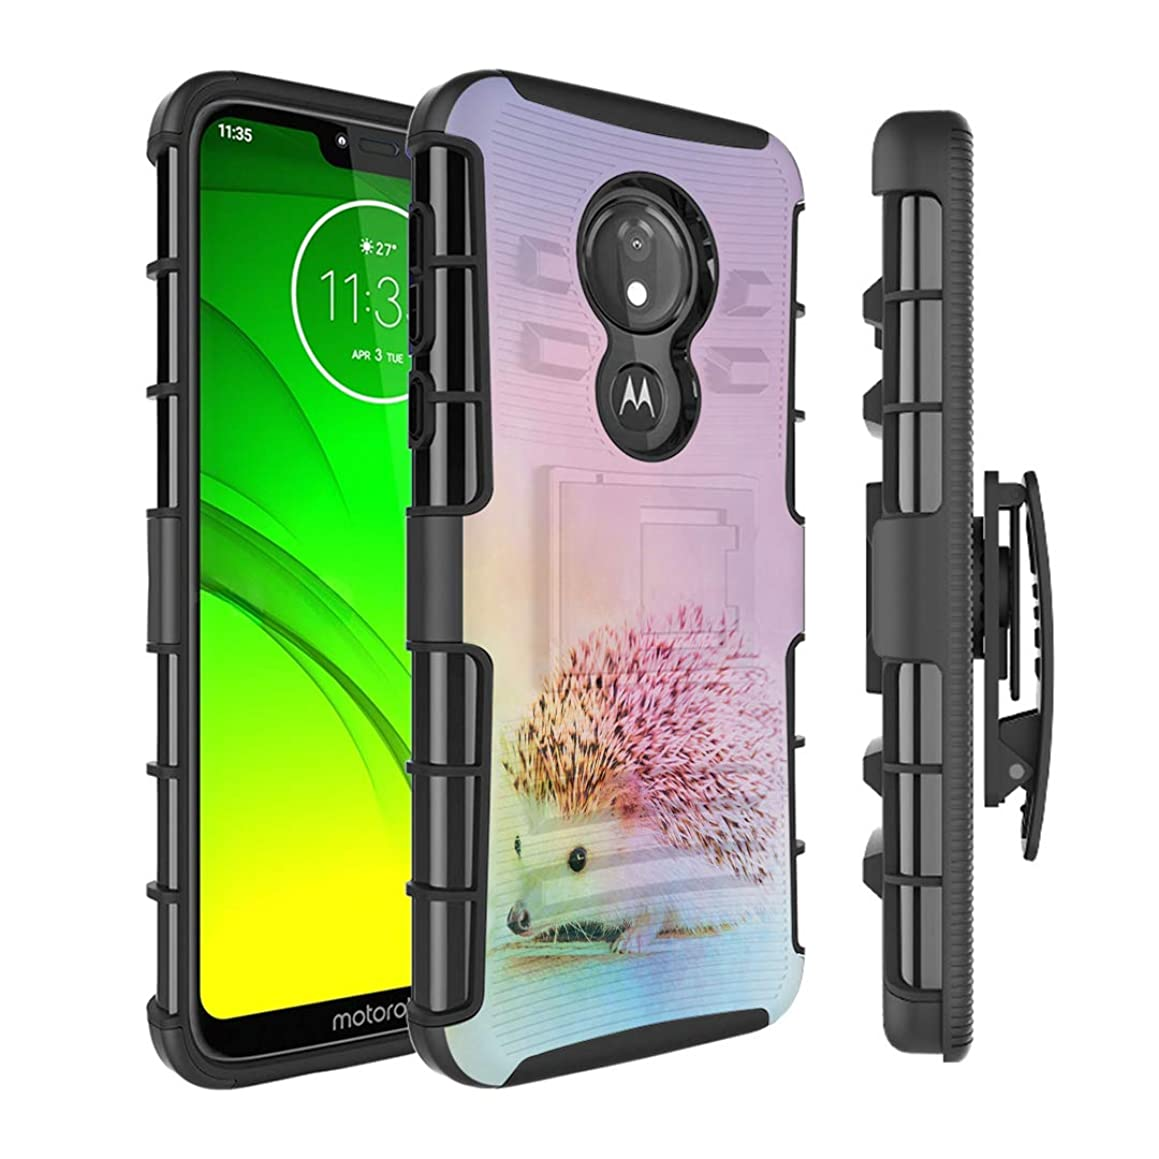 Moriko Case Compatible with Moto G7 Power, Moto G7 Supra [Kickstand Holster Combo Heavy Duty Protection Case Black] for Motorola Moto G7 Power - (Hedgehog)